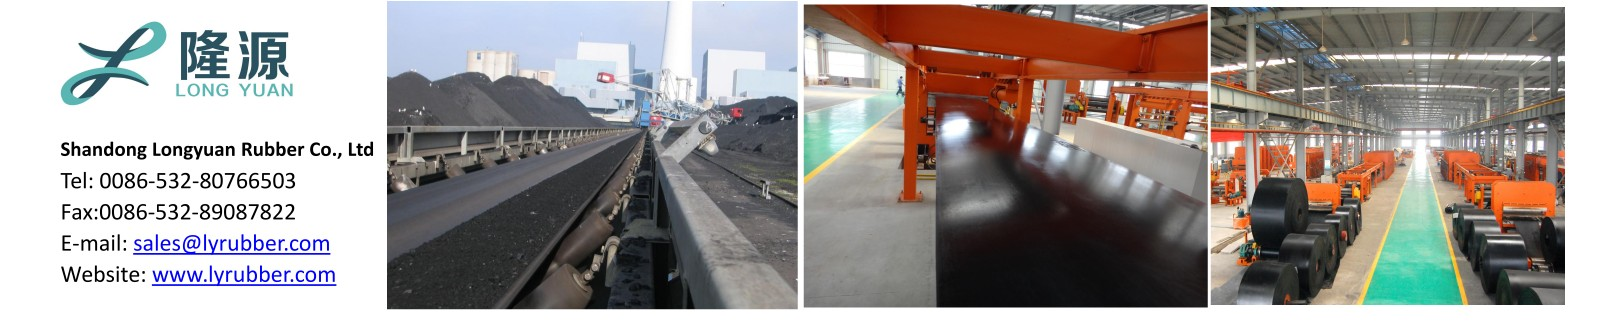 Shandong Longyuan Rubber Co.,Ltd